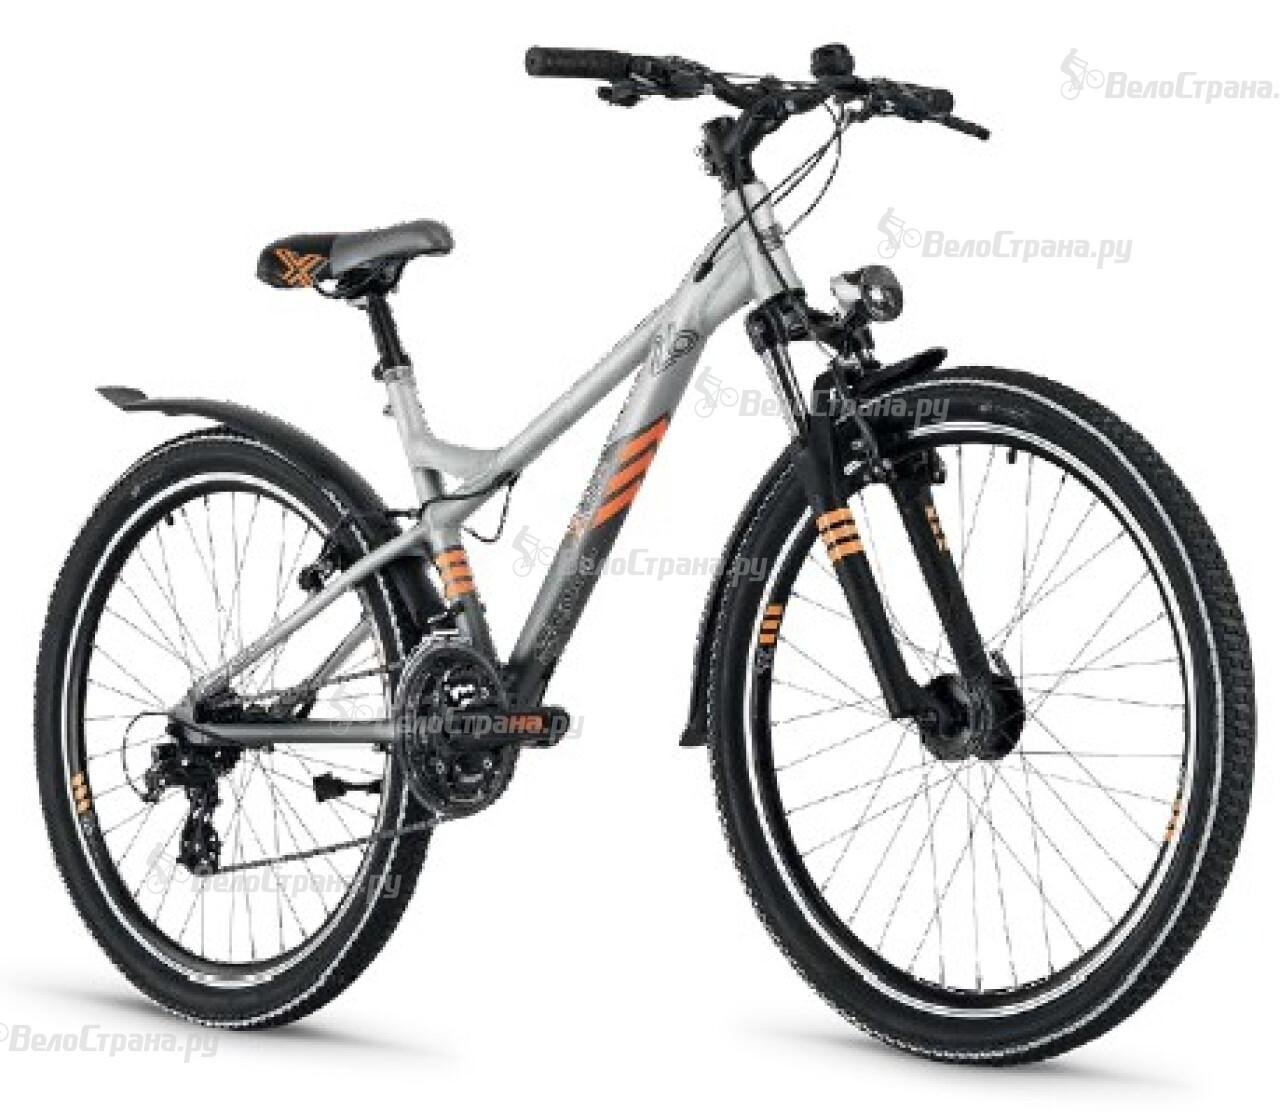 Велосипед Scool XX lite 26 24S (2014) цена